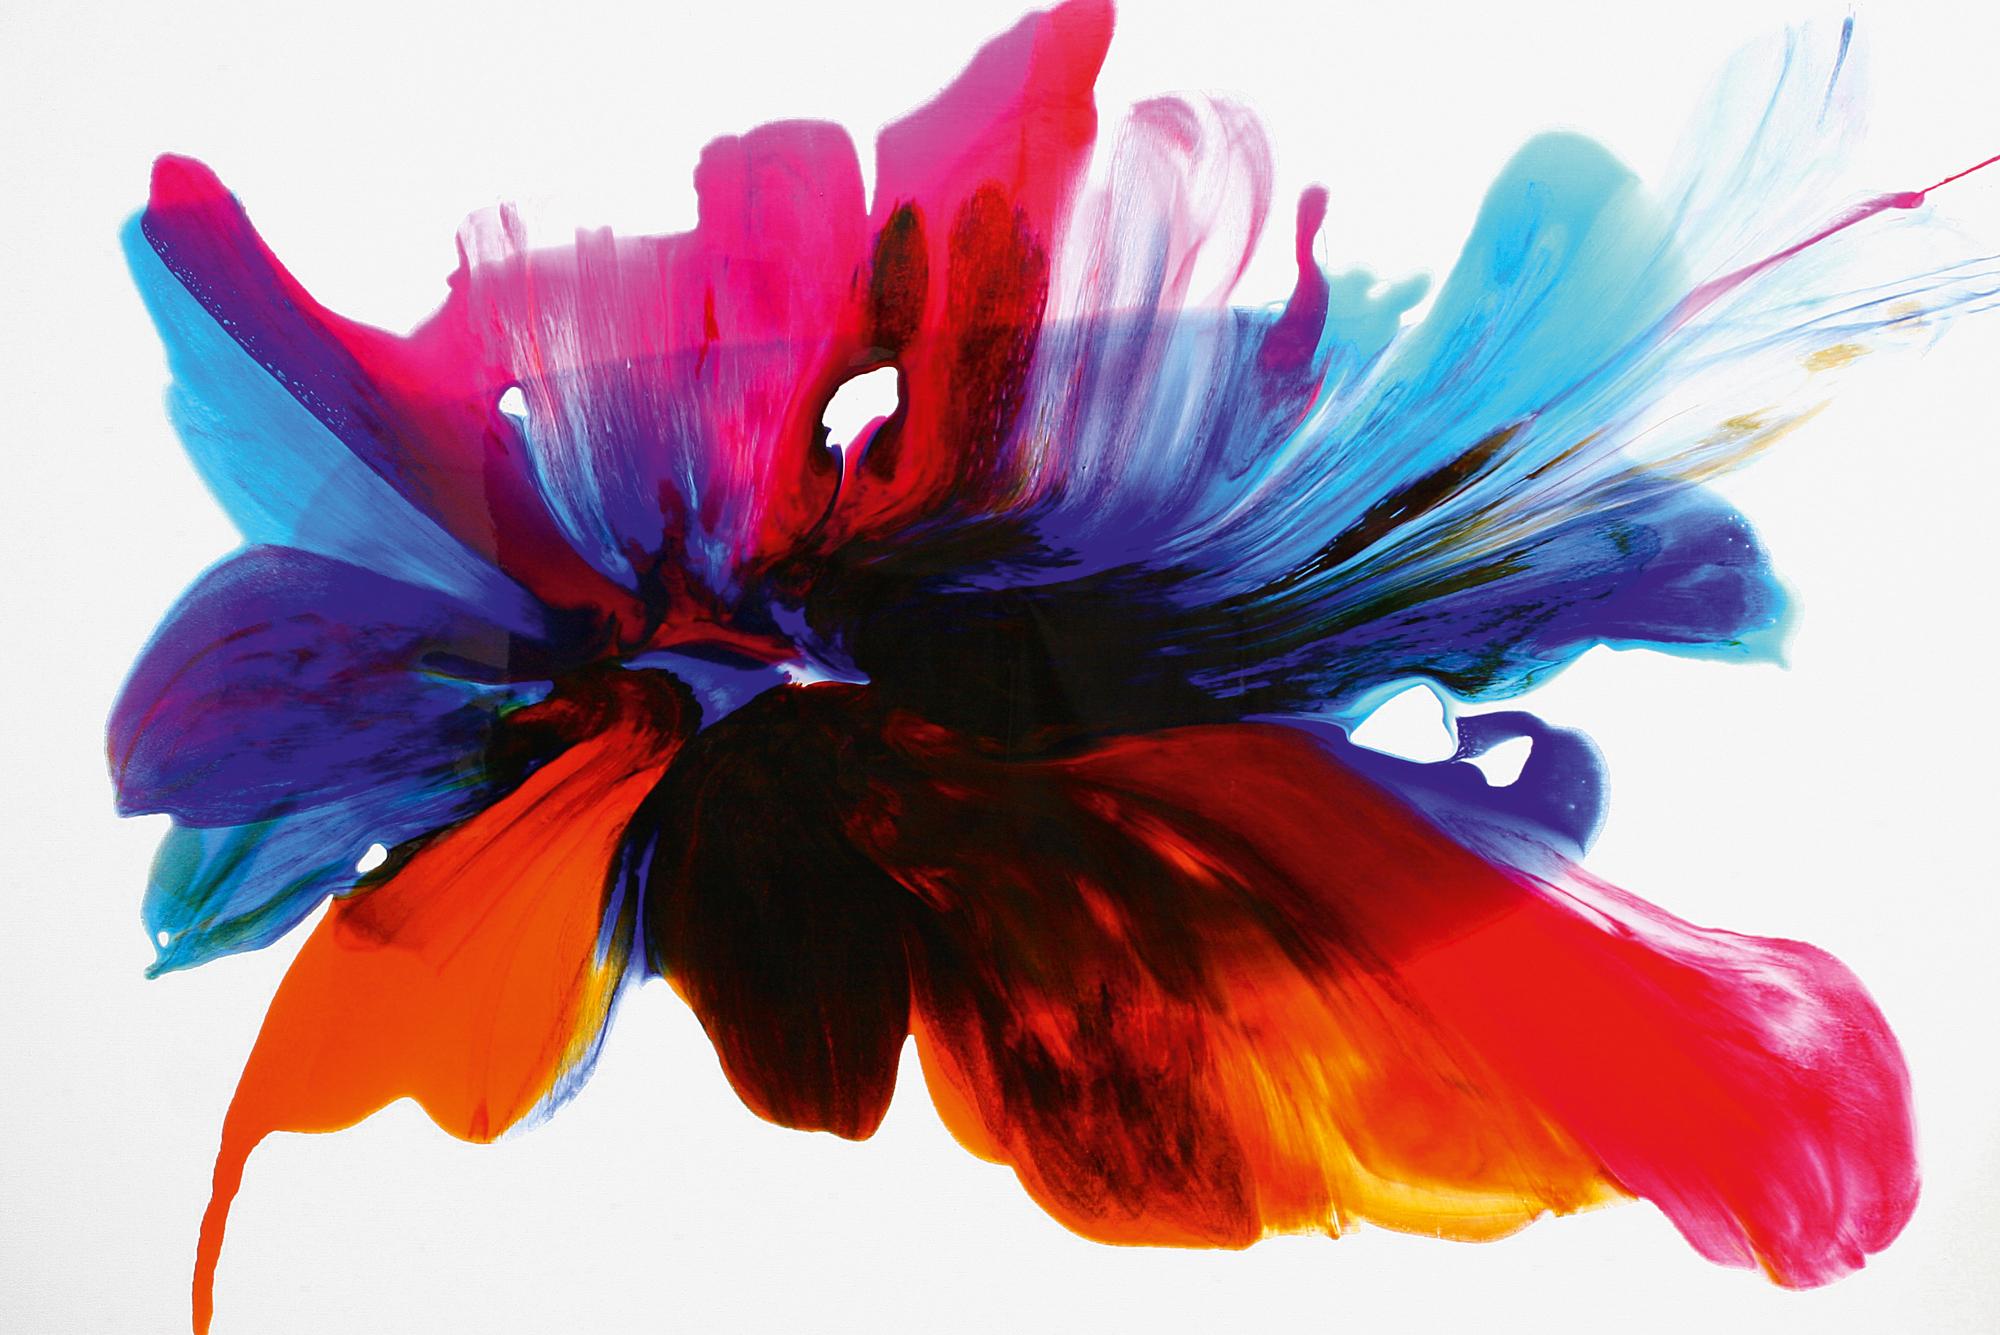 'Bee Bait' Orlanda Broom Resin on canvas, 100cm x 180cm, 2016